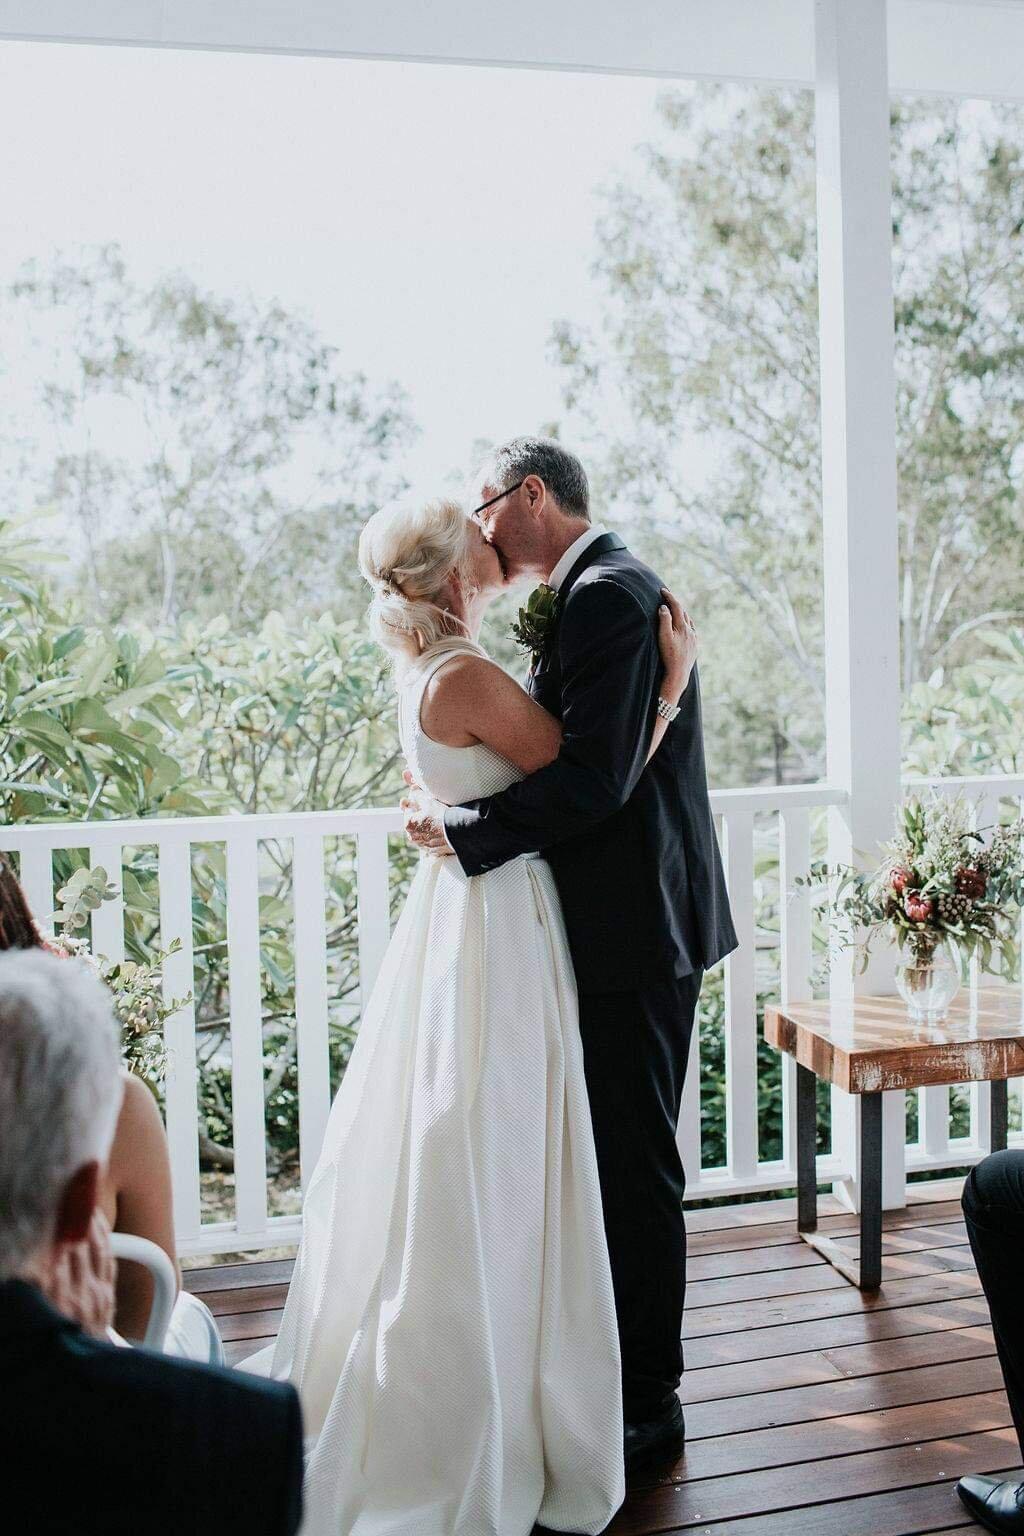 bespoke-bridal-shop-designer-helena-couture-designs-custom-wedding-dresses-gold-coast-brisbane-affordable-suzie10